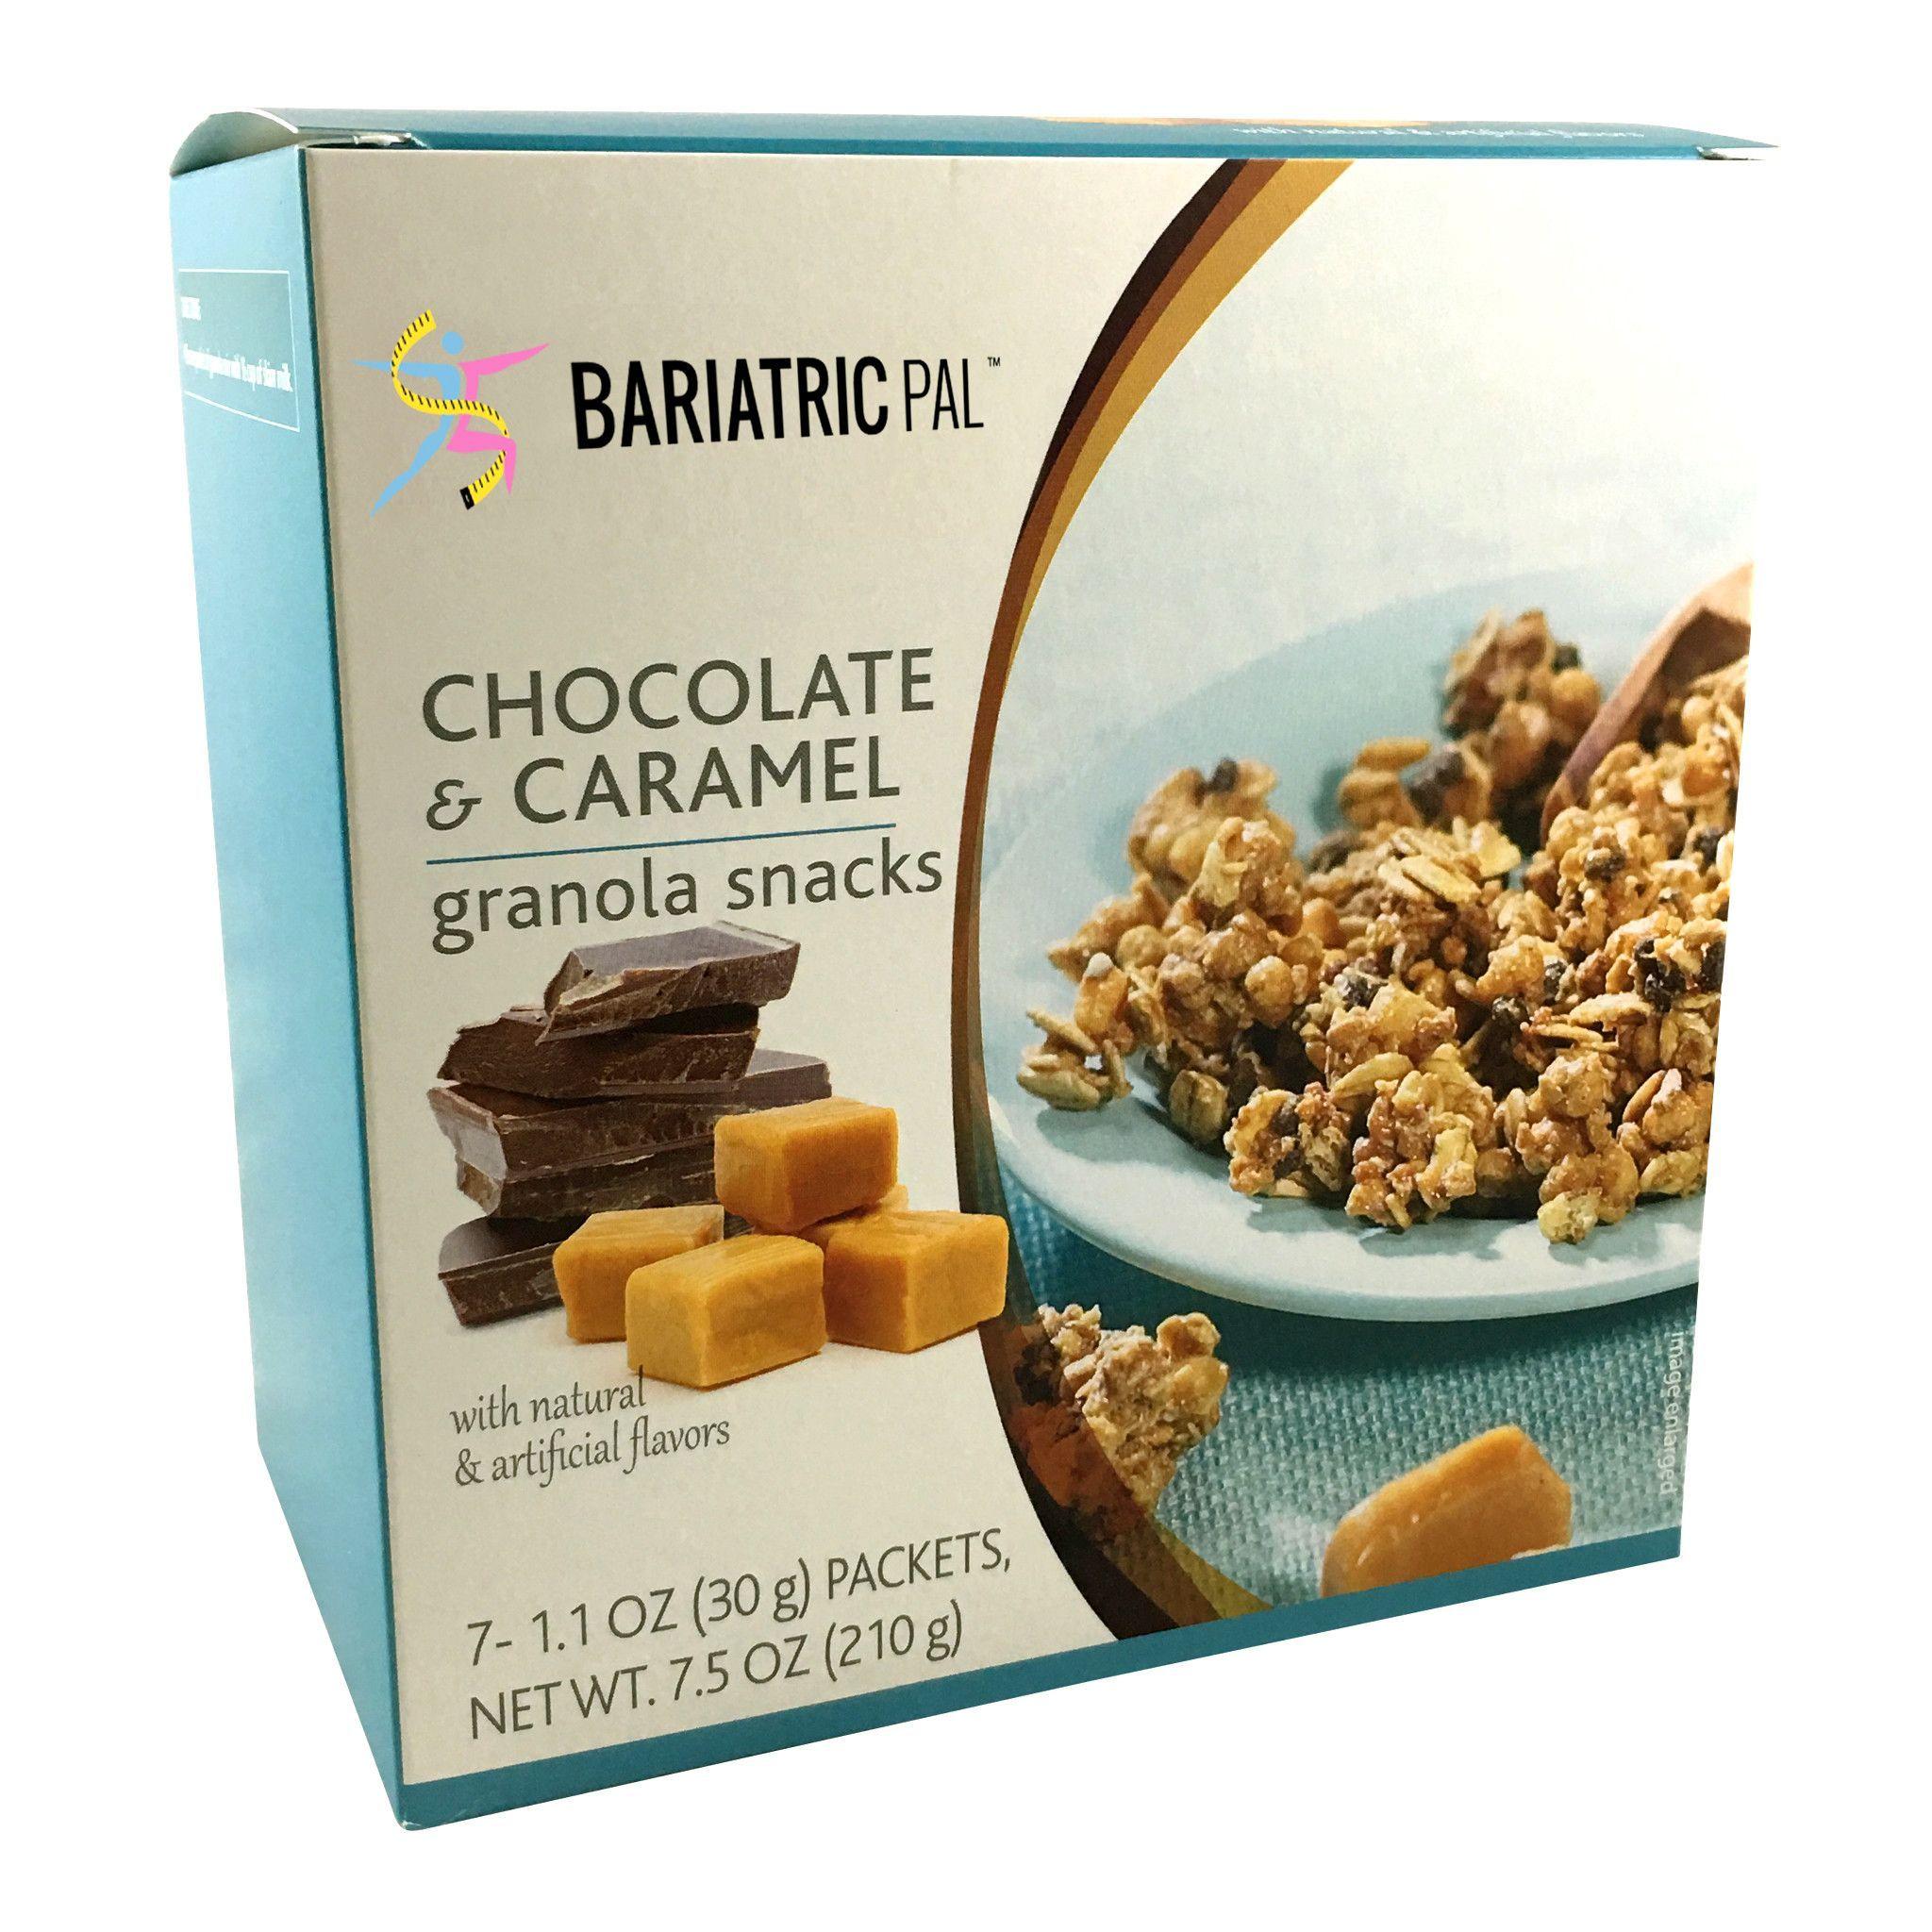 BariatricPal Chocolate Caramel Protein Granola